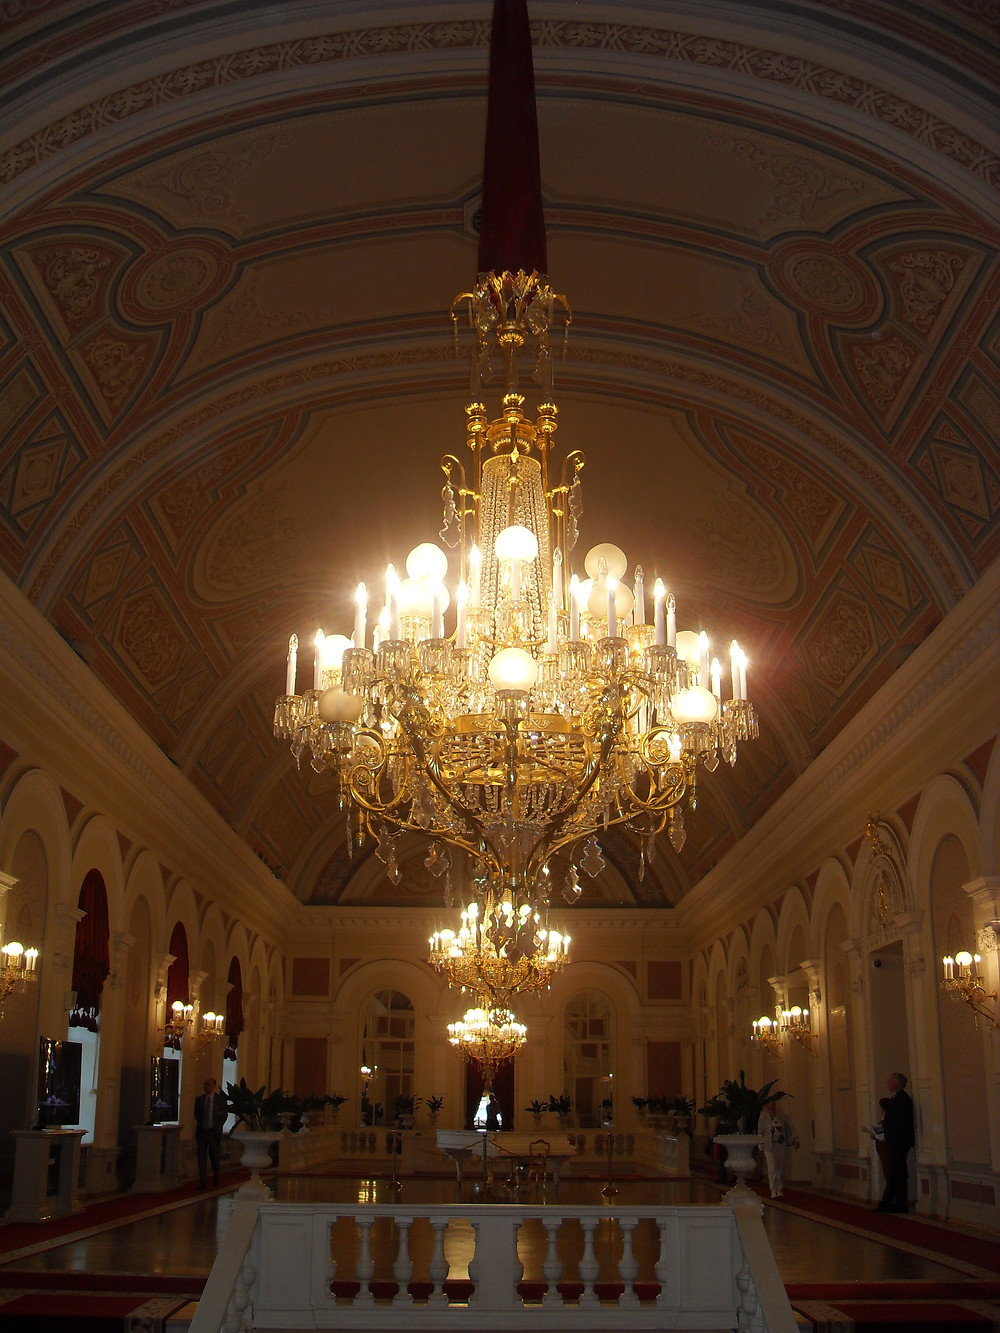 Un des halls du Bolshoi, après restauration, en juillet 2015. © 2016 Globetrotterka